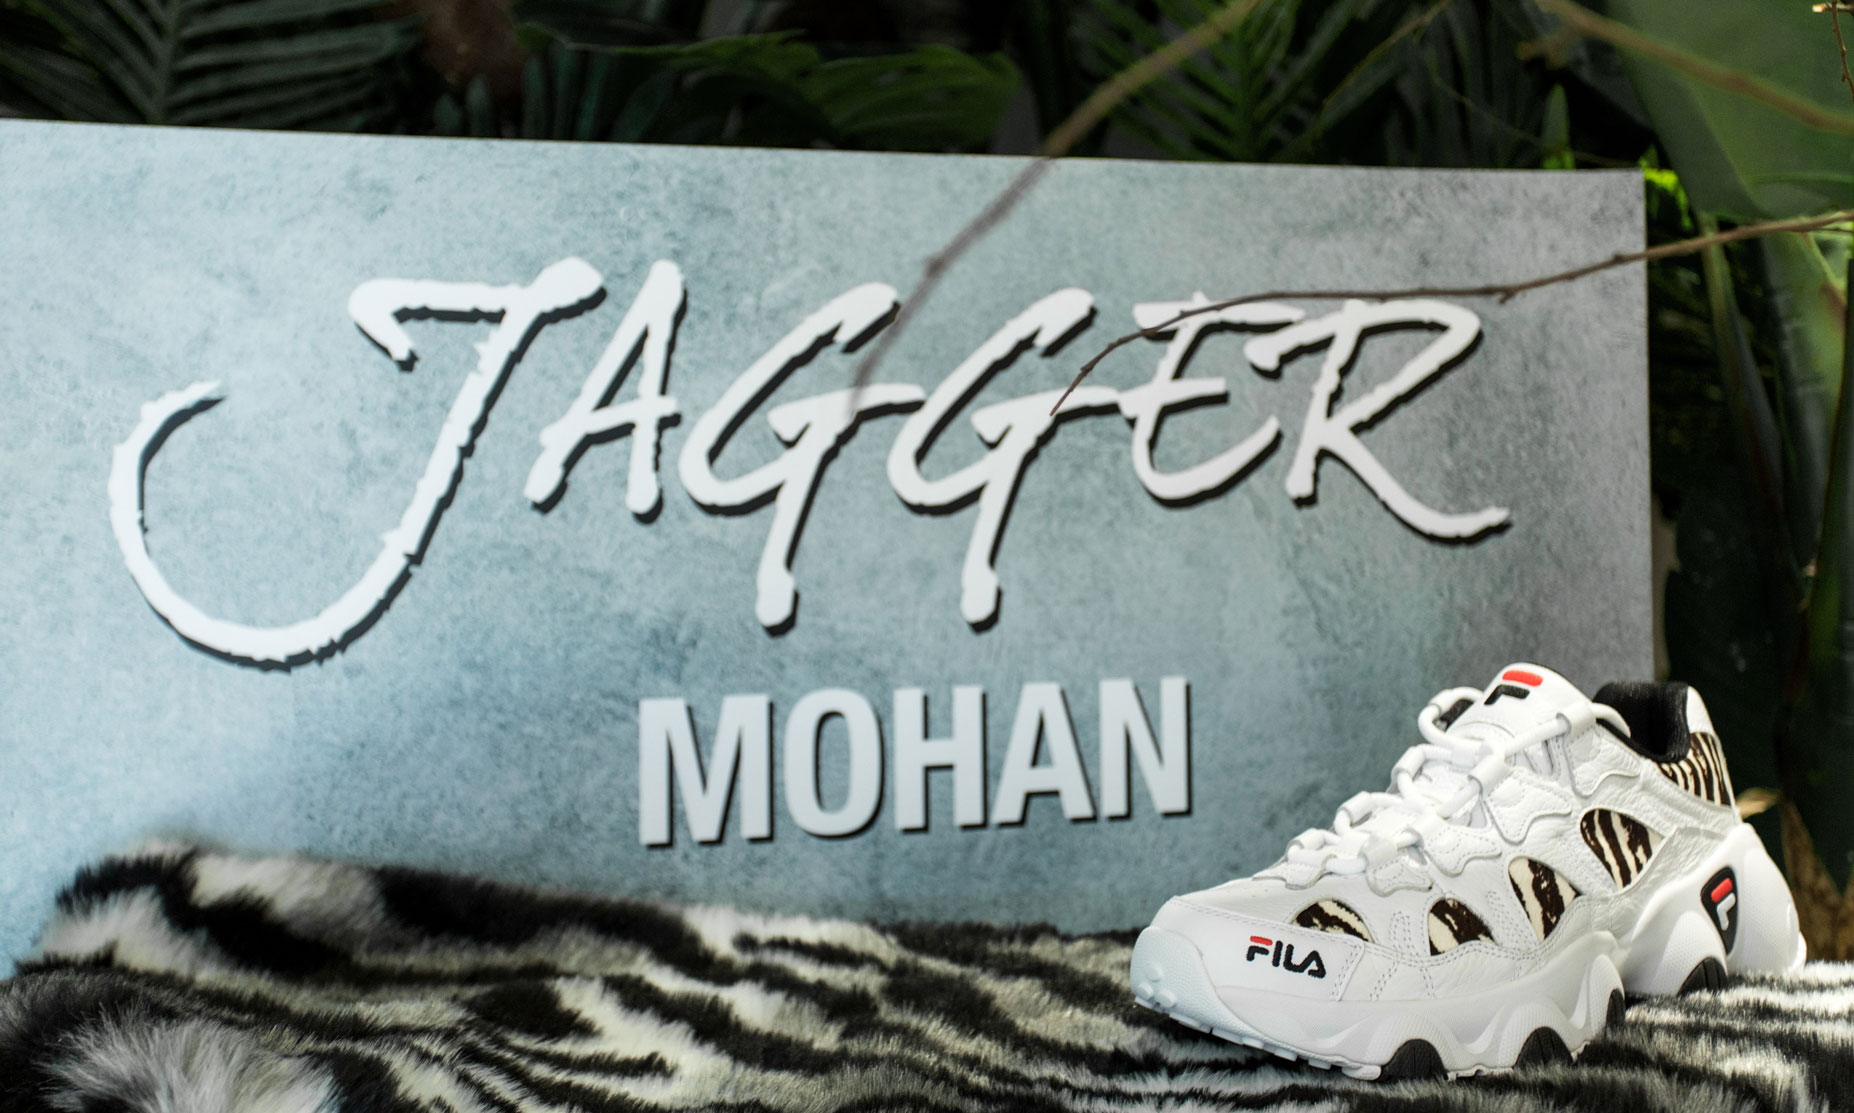 FILA FUSION JAGGER MOHAN 登陆 CONCEPTS 全球首发